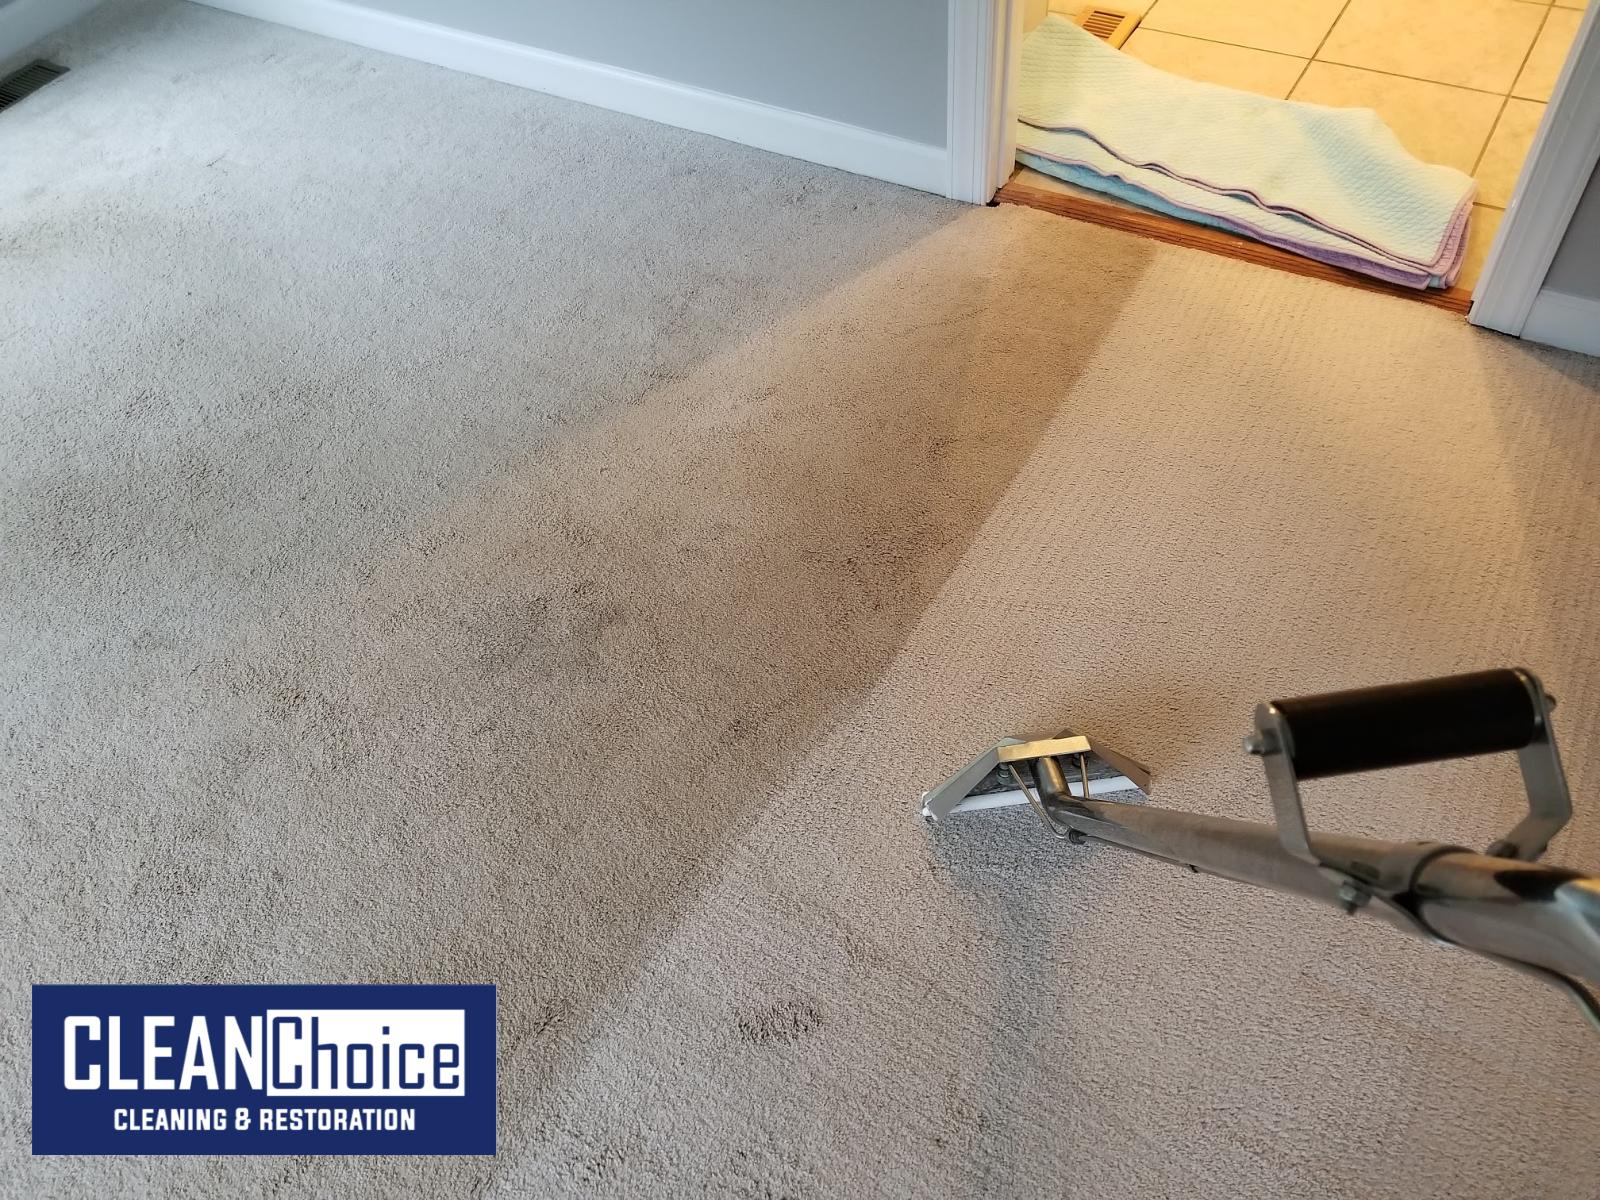 Professional Carpet Cleaning Glen Burnie Maryland